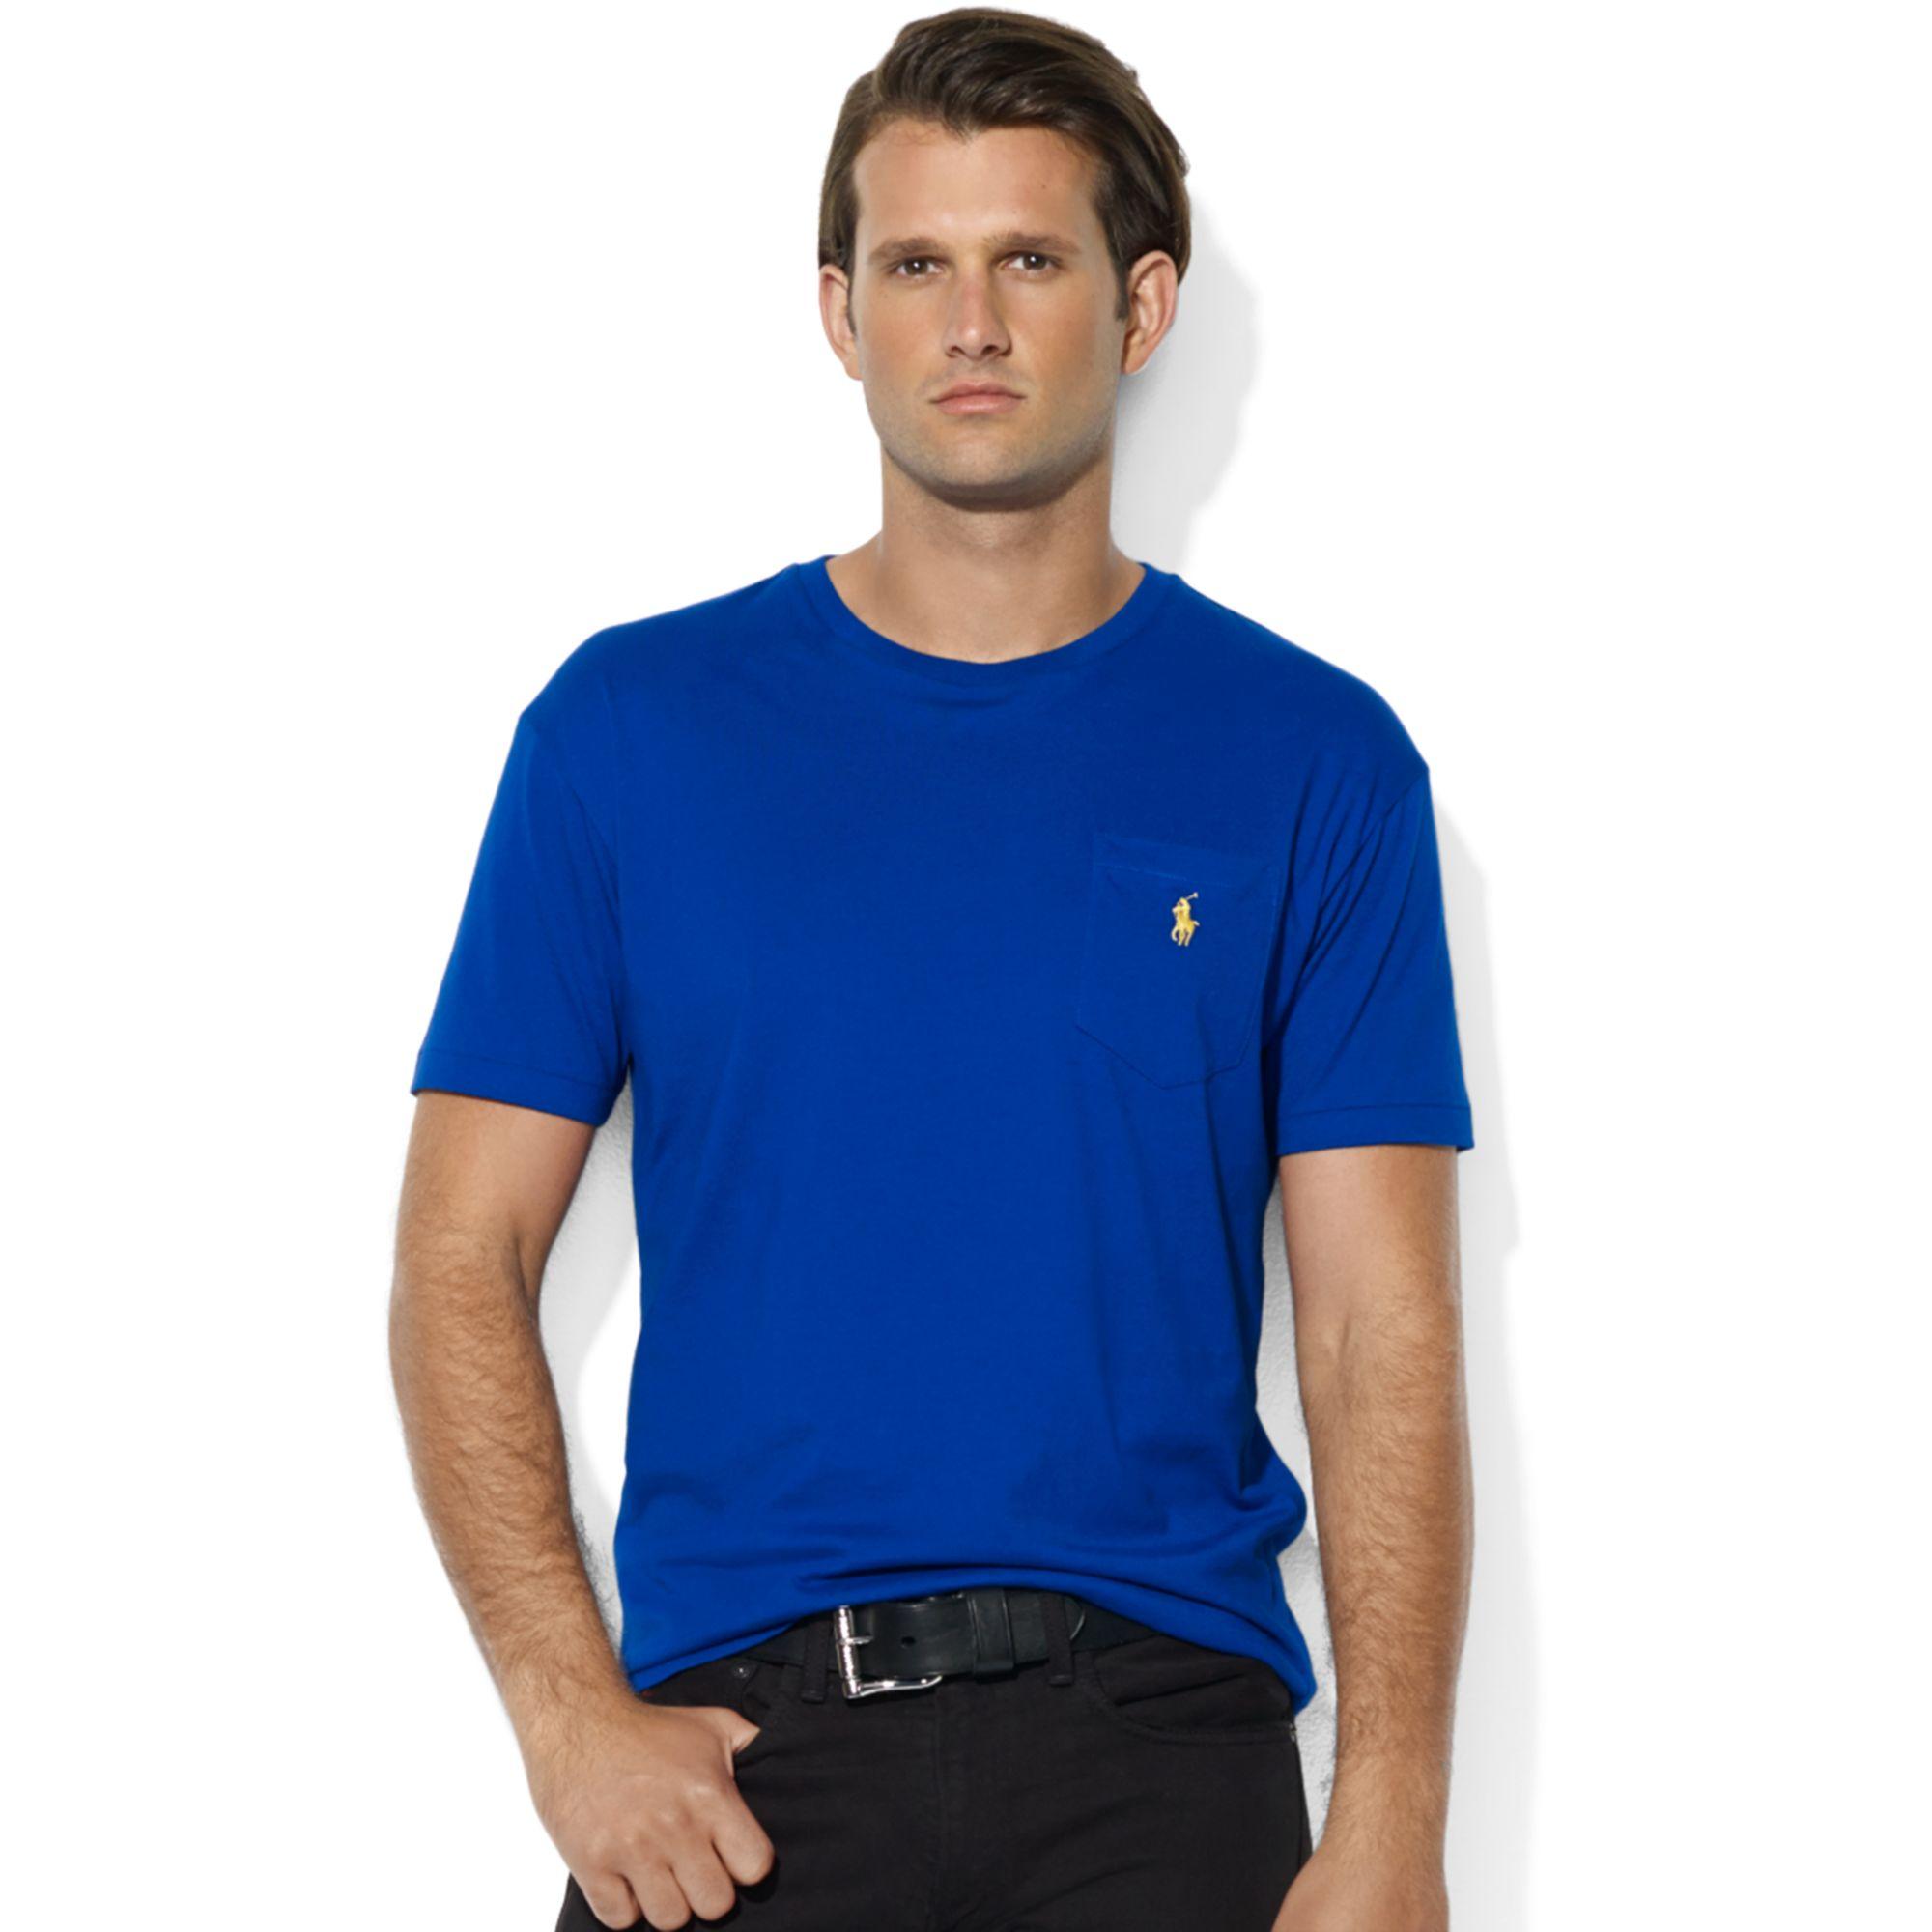 polo ralph lauren classic fit pocket t shirt